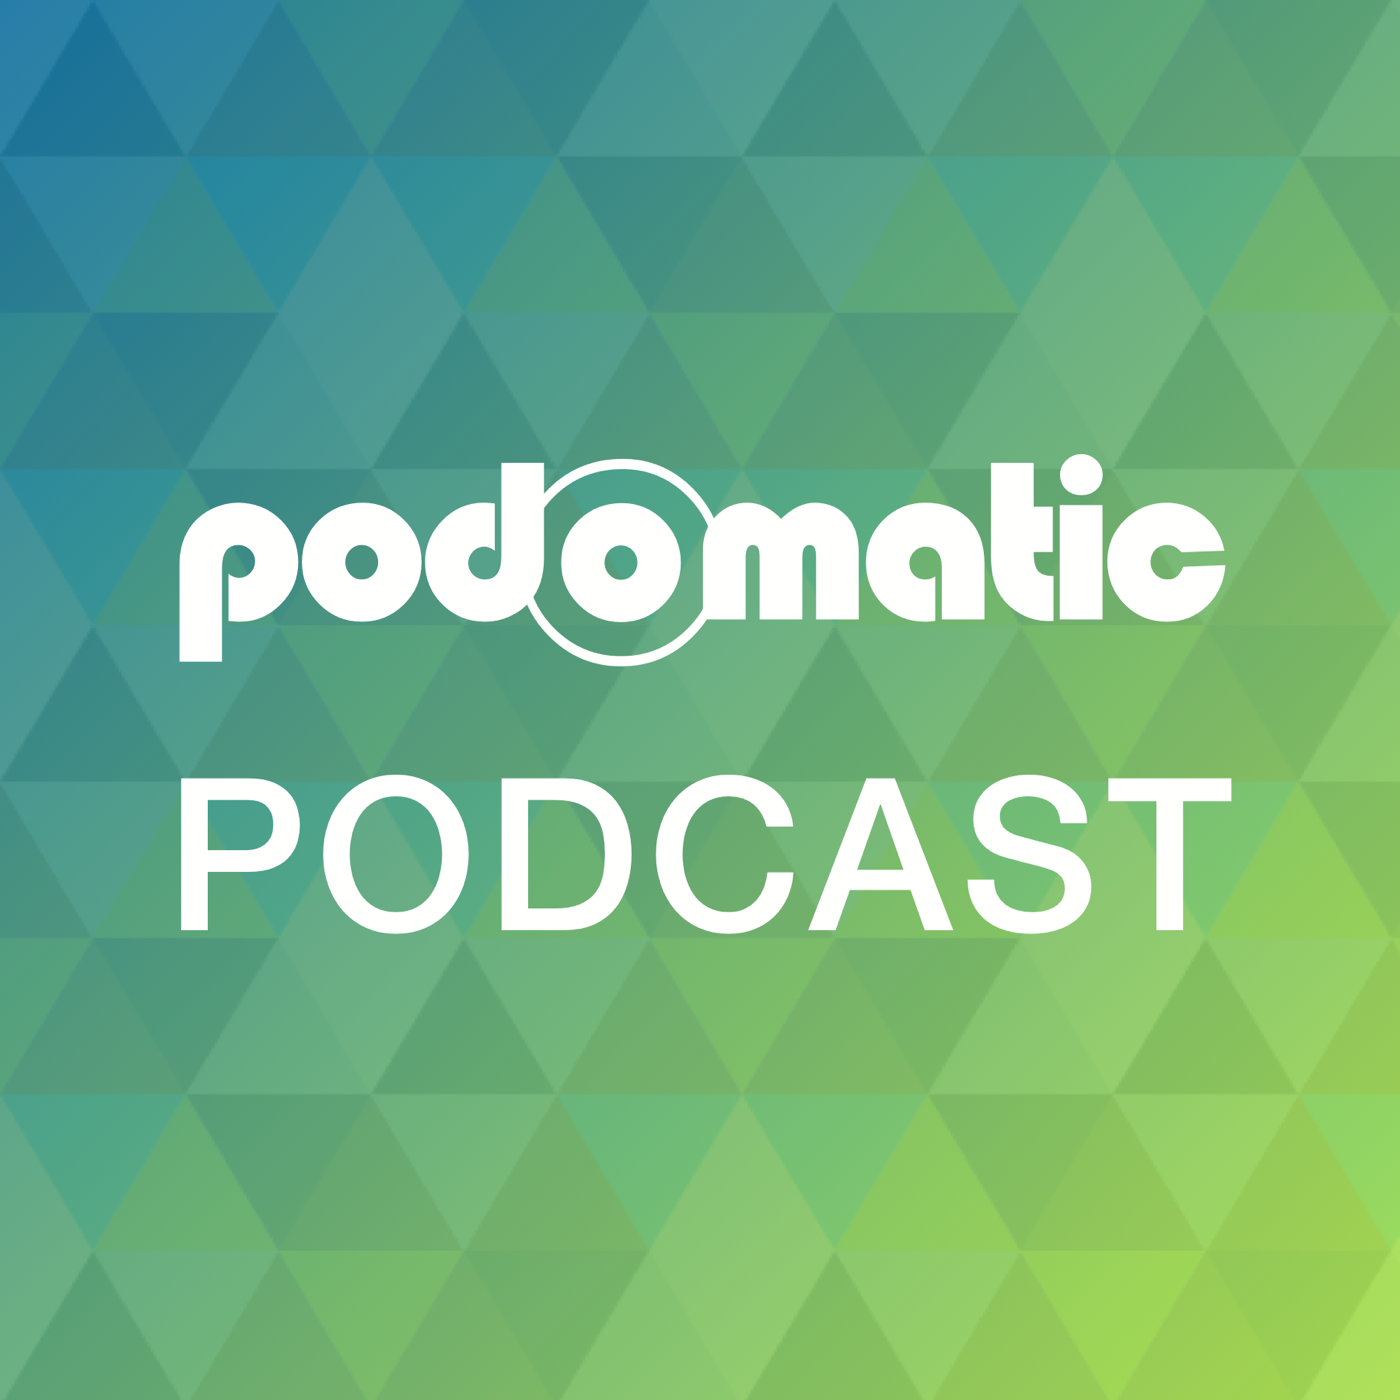 Matthew Gutierrez's Podcast